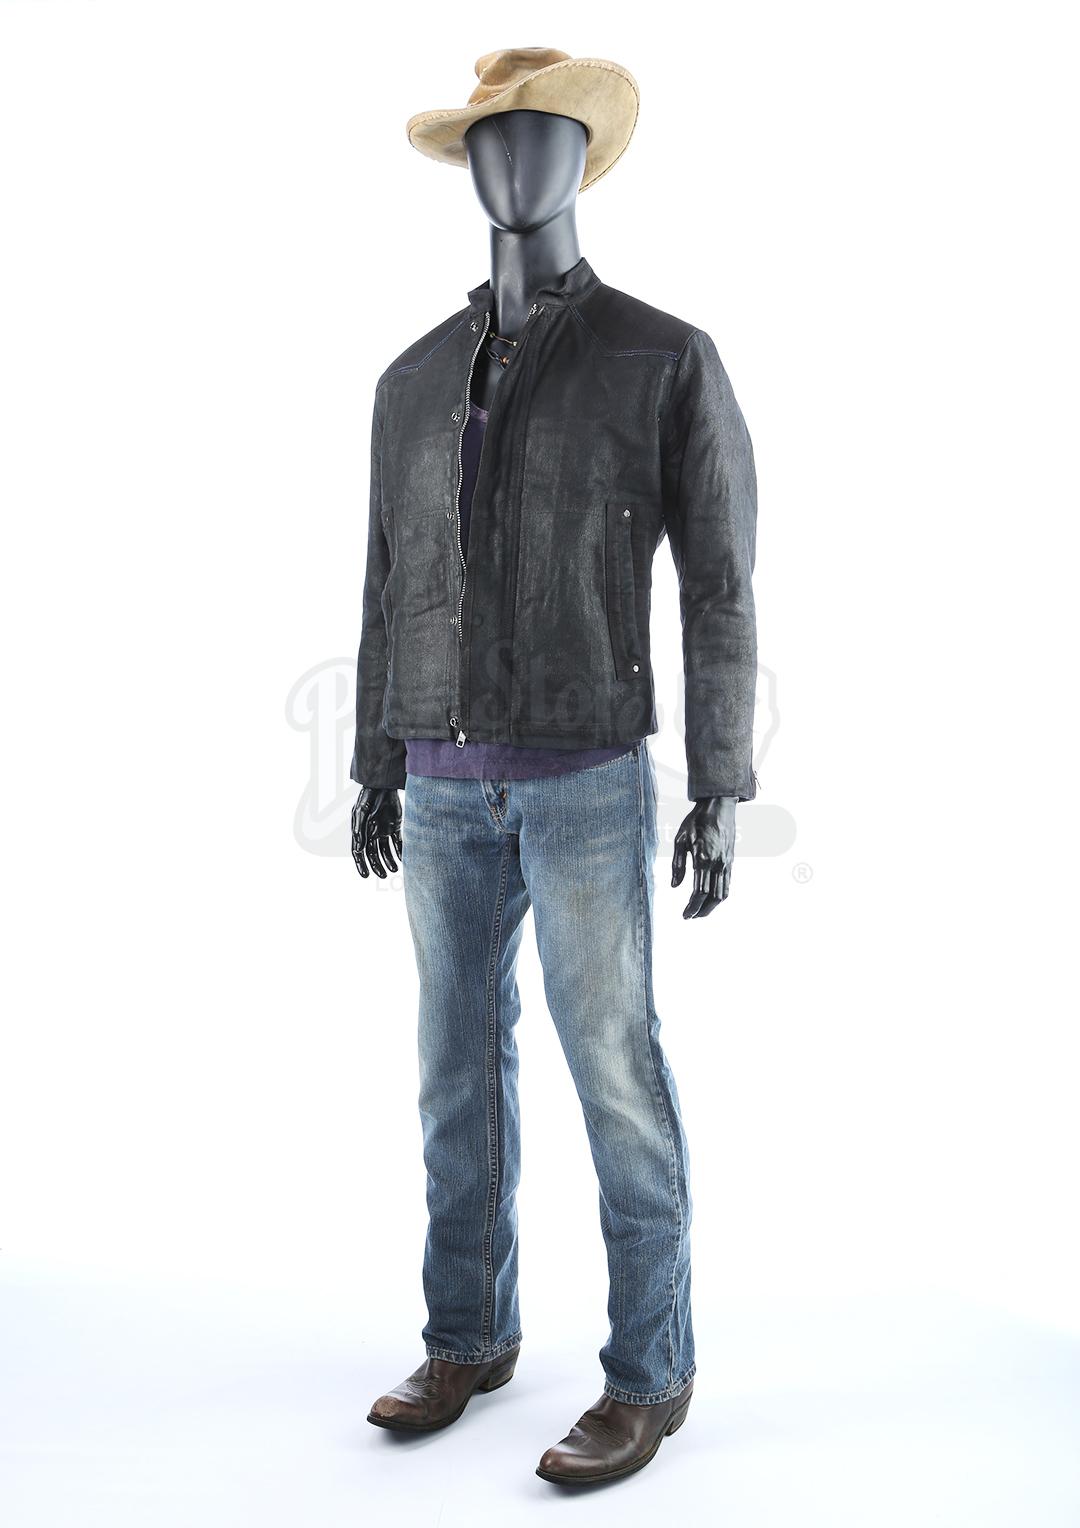 Zombieland. Tallahassee s (Woody Harrelson) Stunt Costume. Stock   81732 da78f9fea9bb